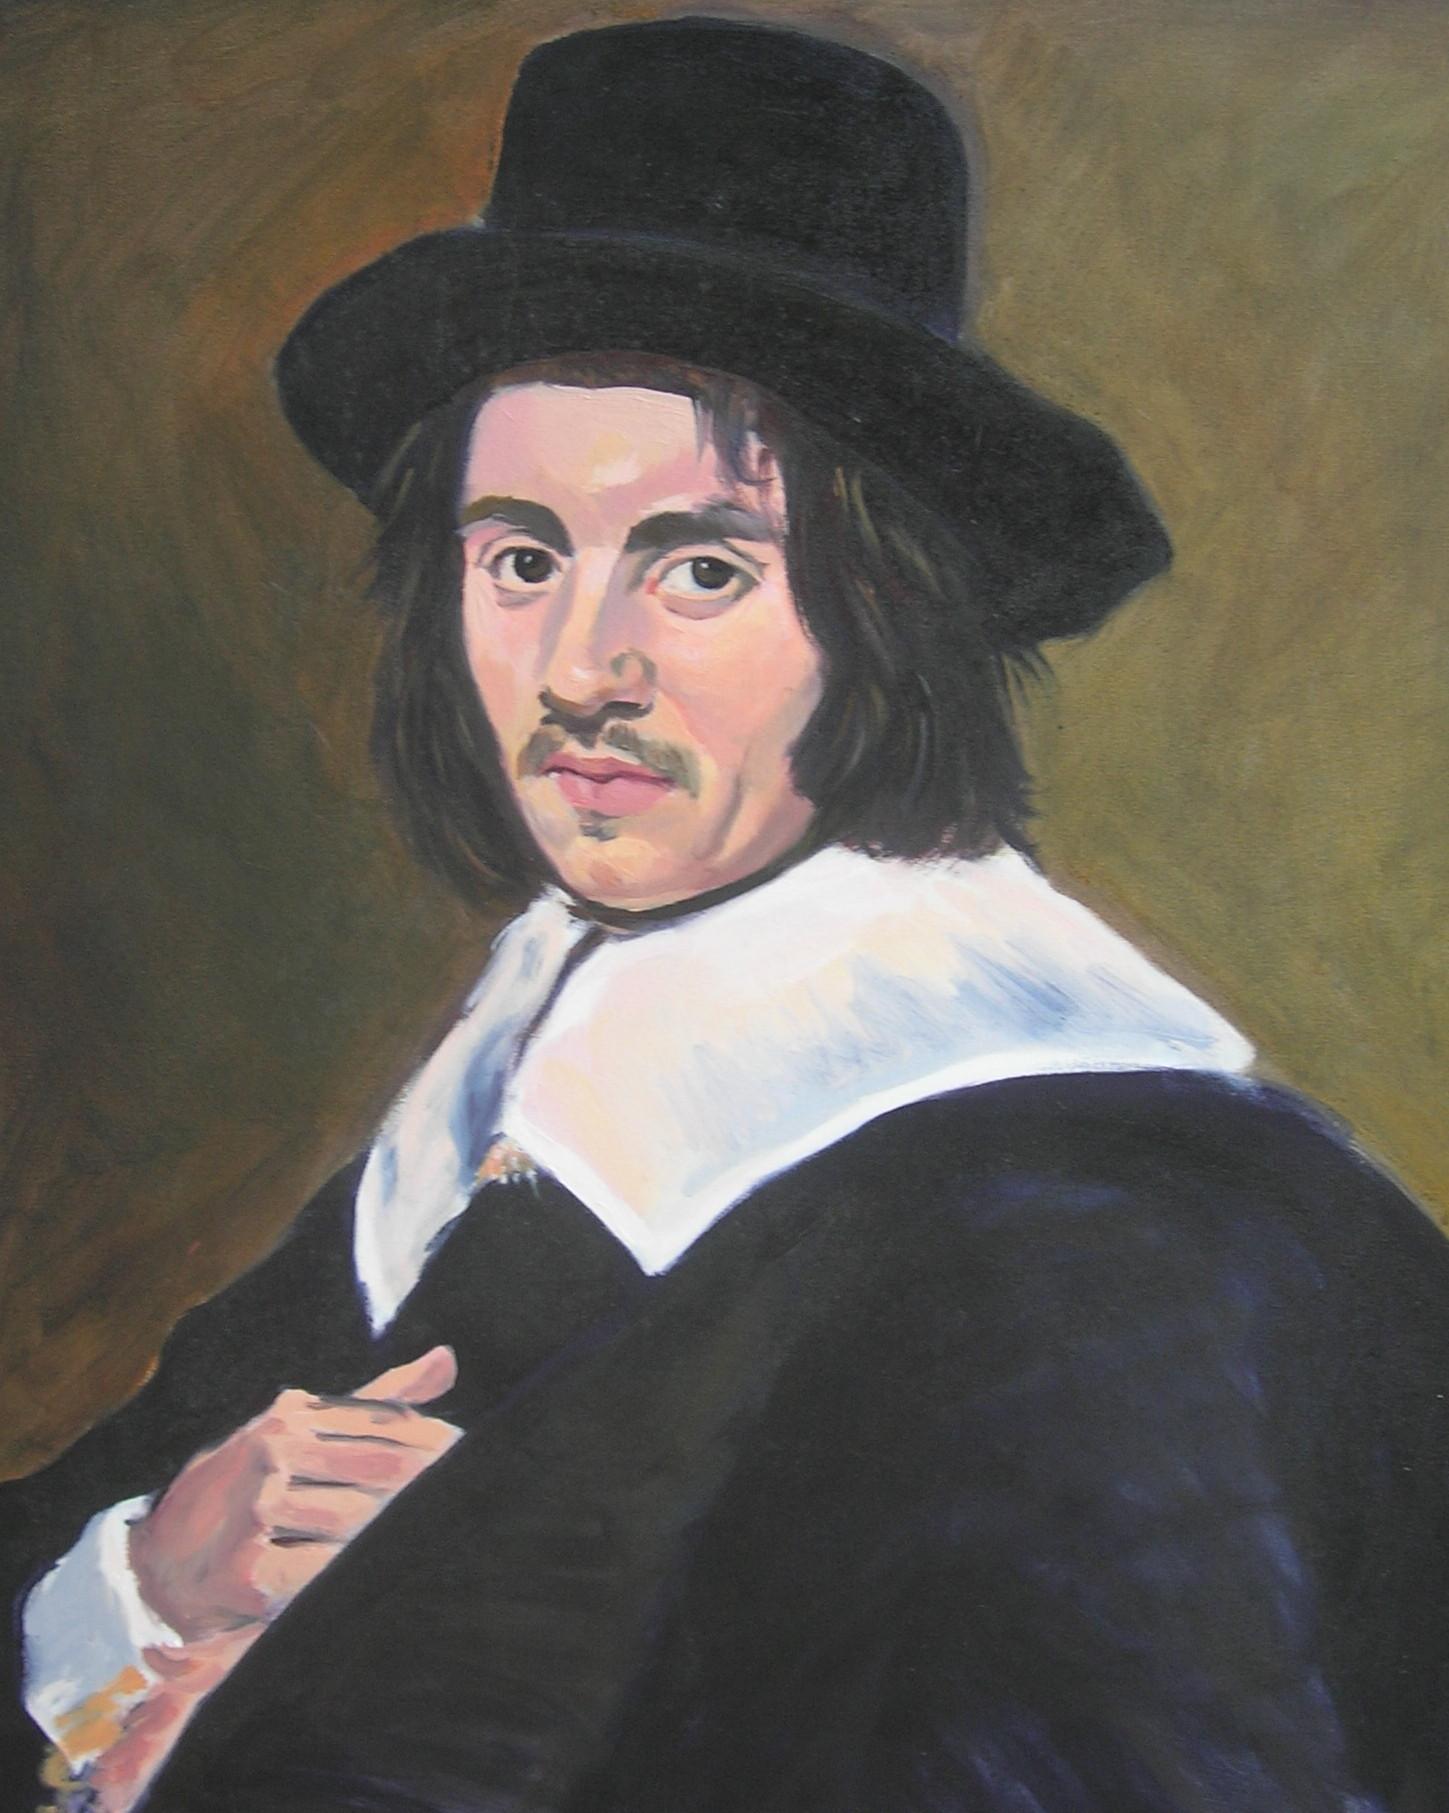 Copy after Frans Hals    Portrait of a Man